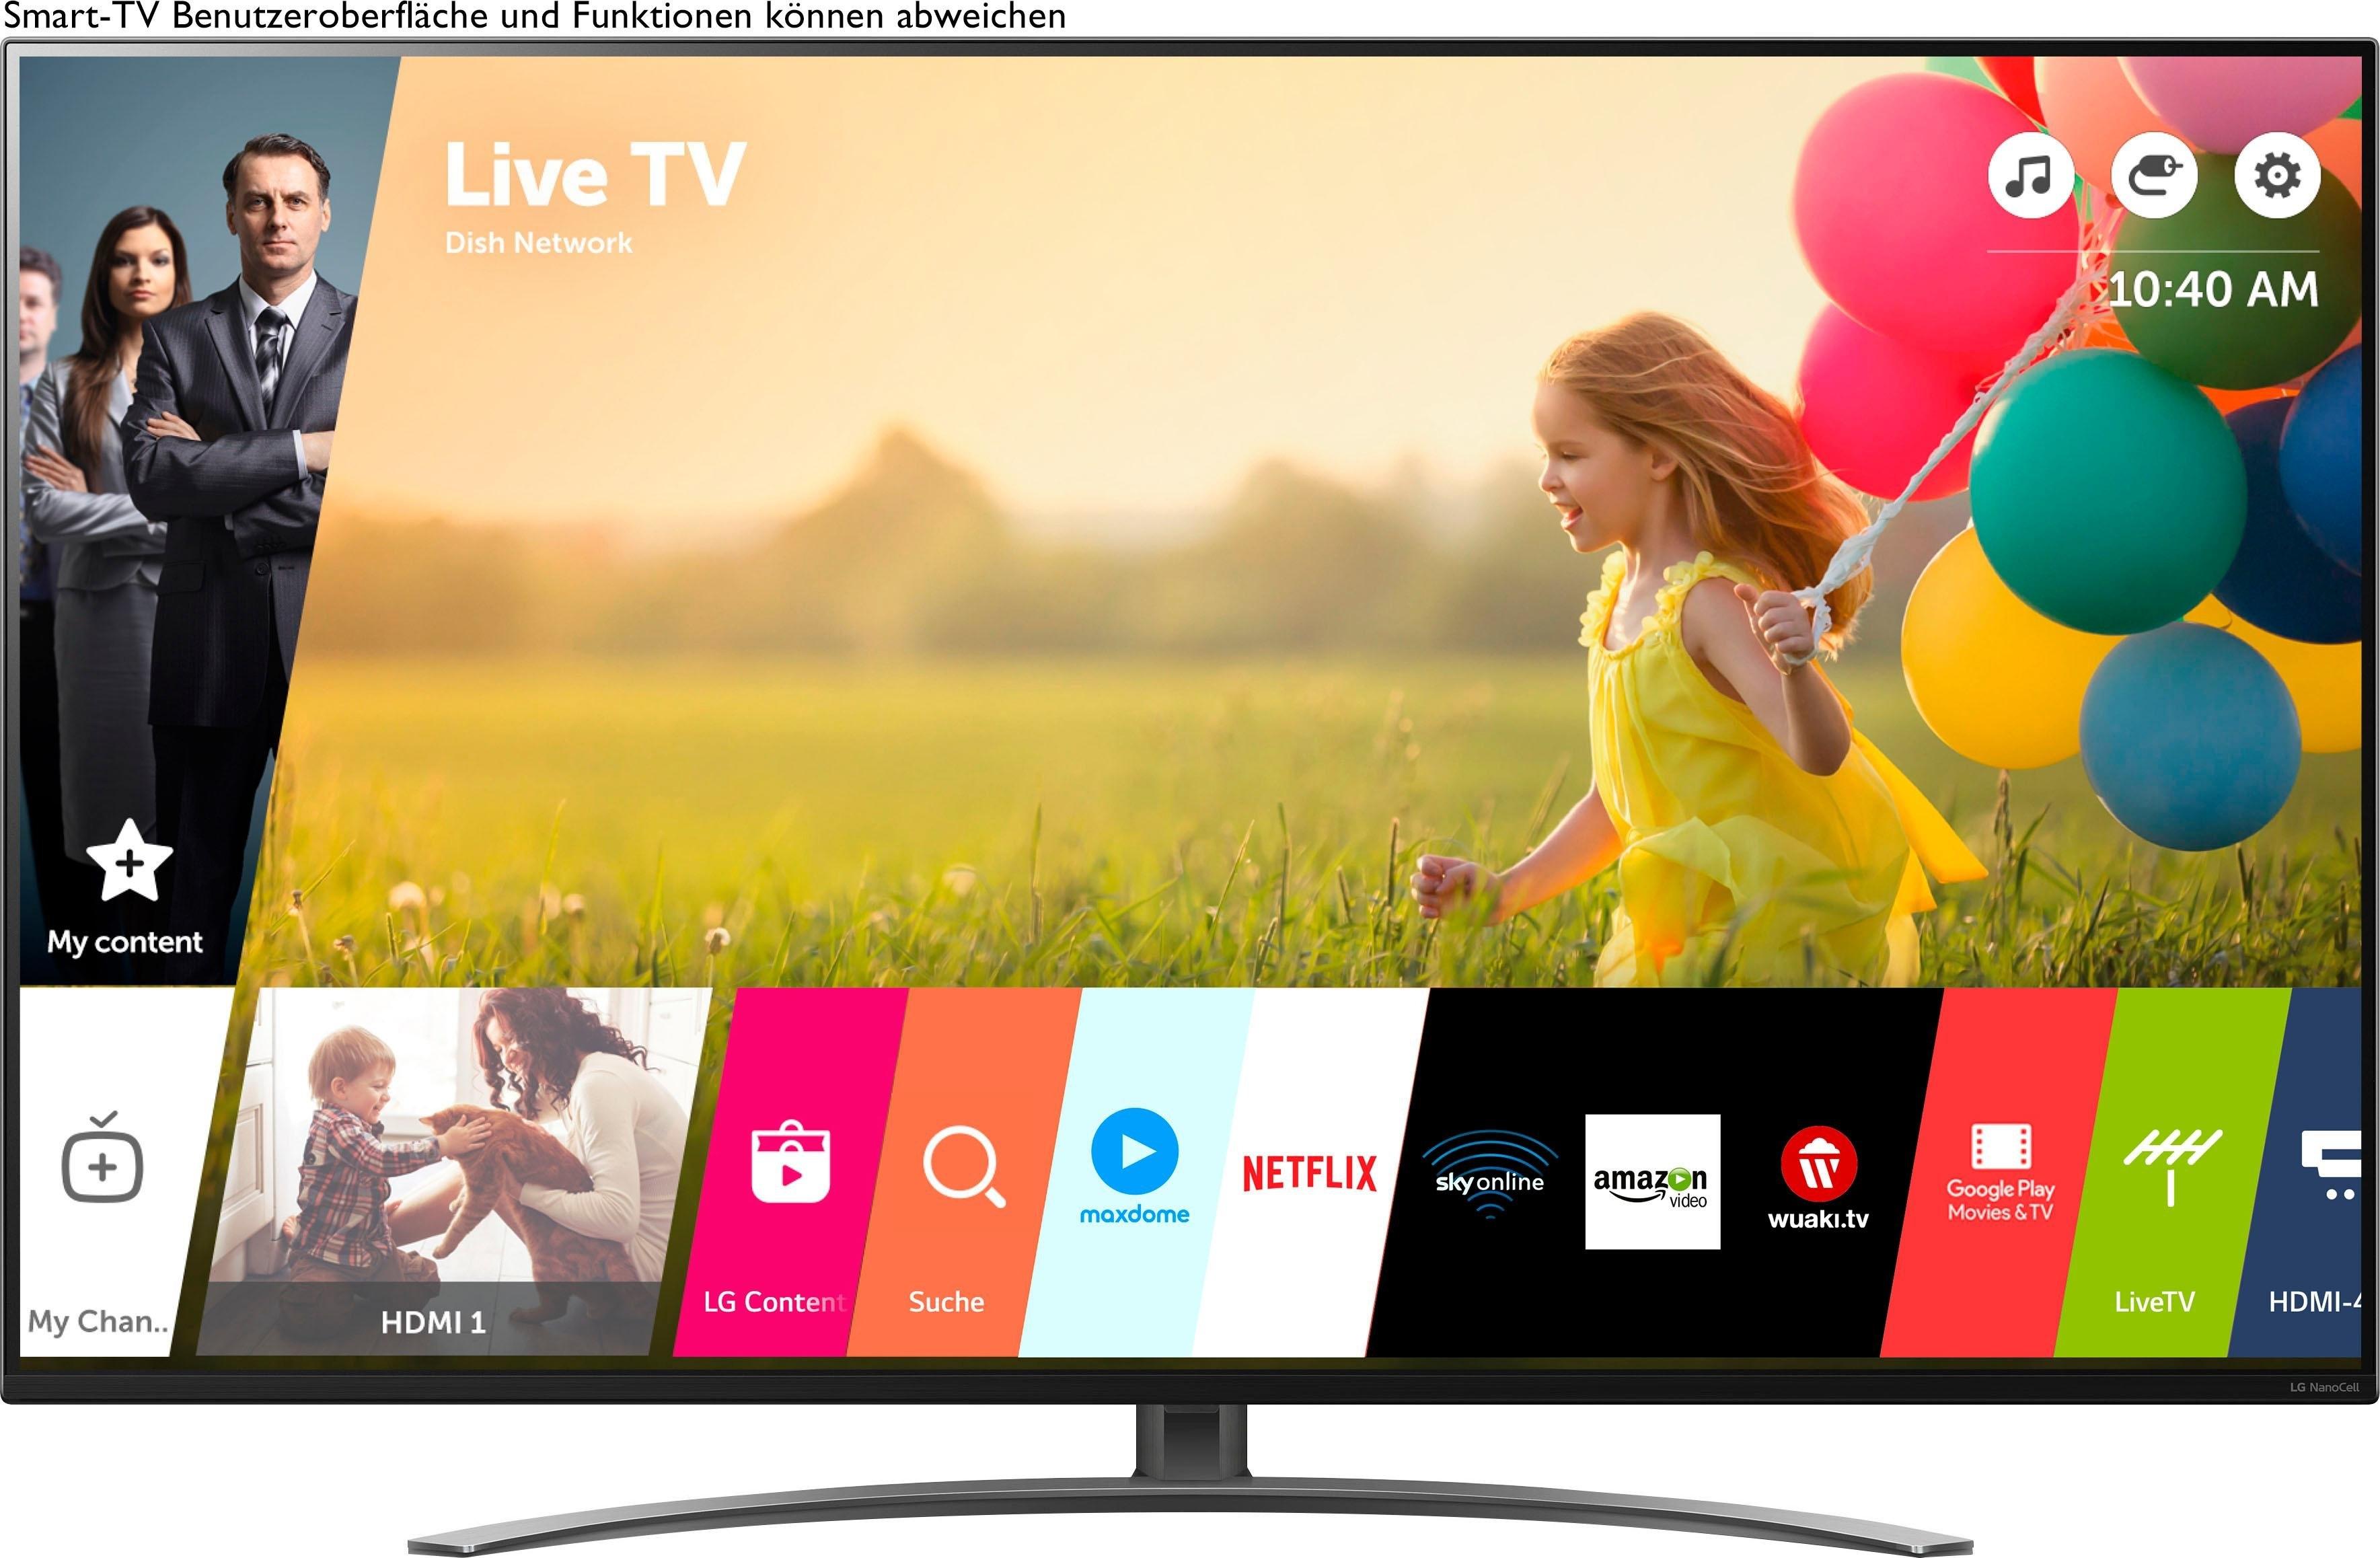 LG 65NANO867NA LED-televisie (164 cm / (65 Inch), Smart-TV bestellen: 30 dagen bedenktijd